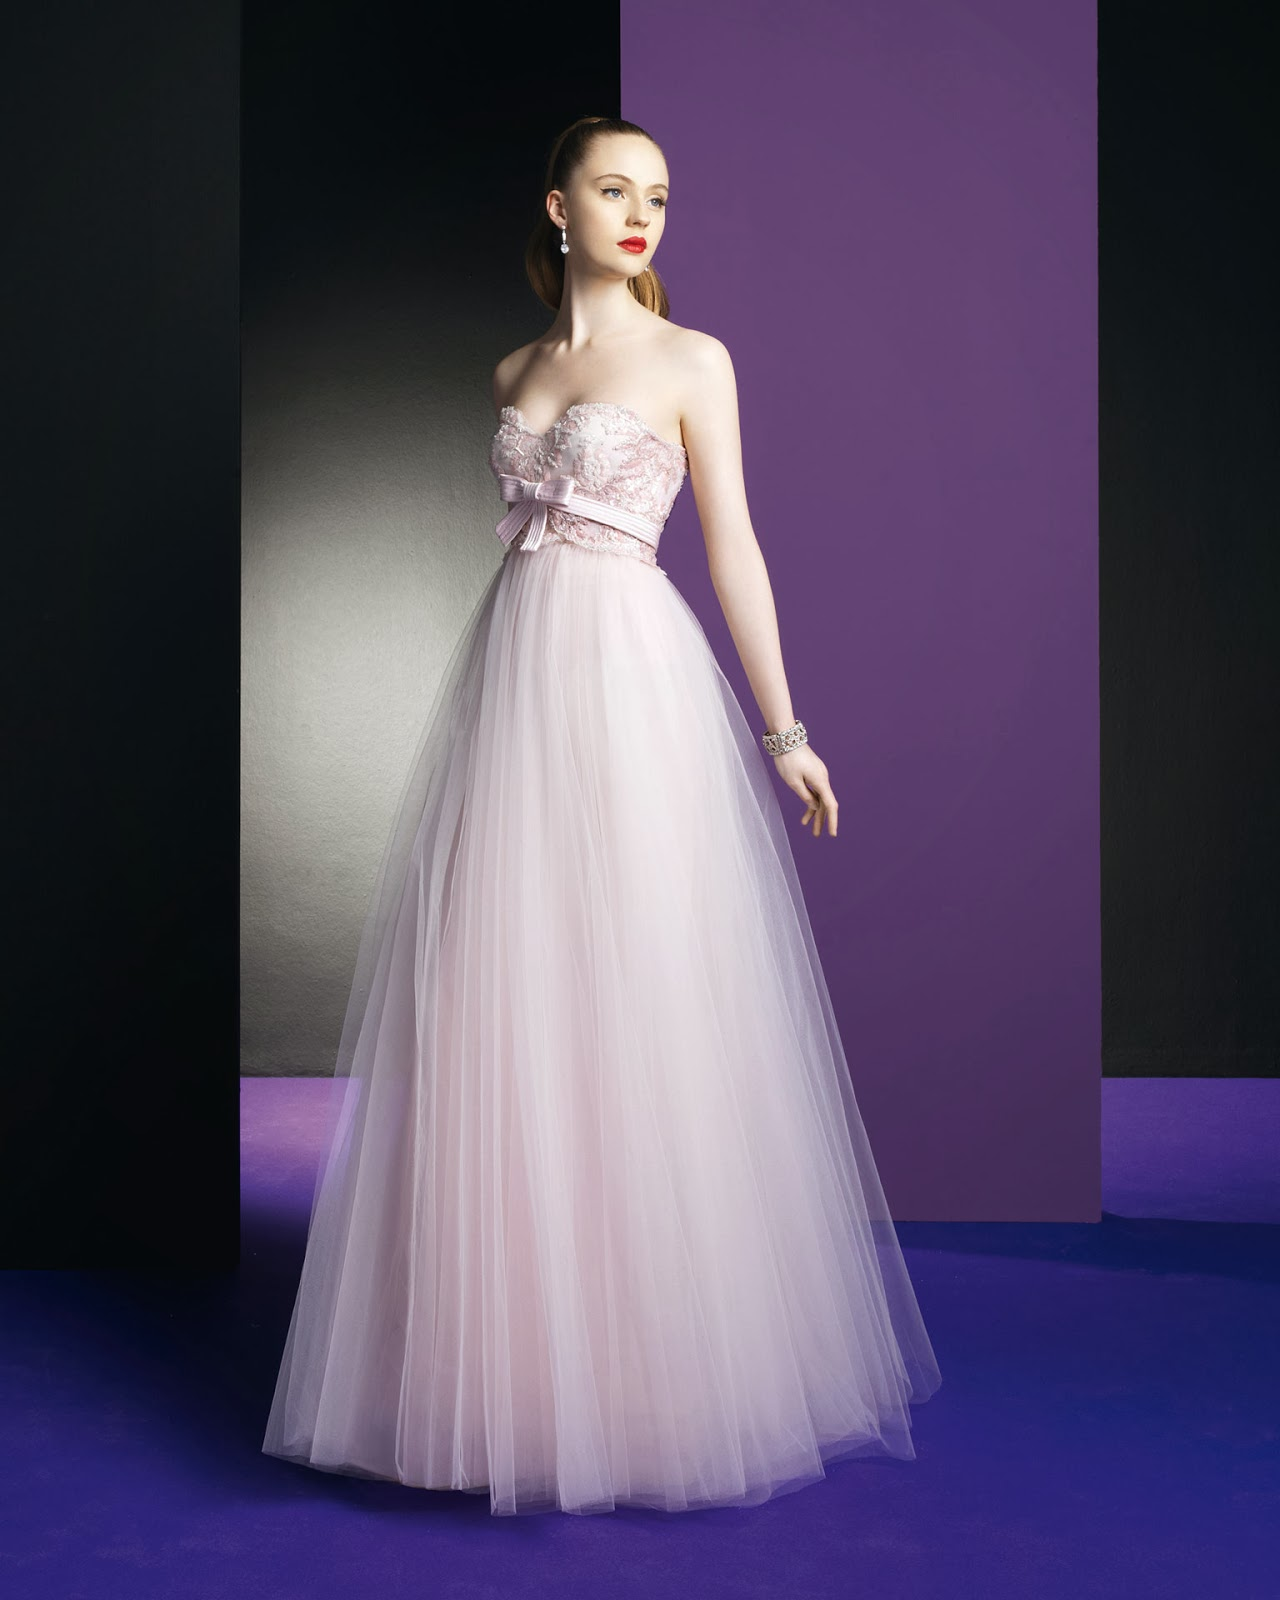 Increíble Vestido De Novia Calvin Klein Composición - Vestido de ...